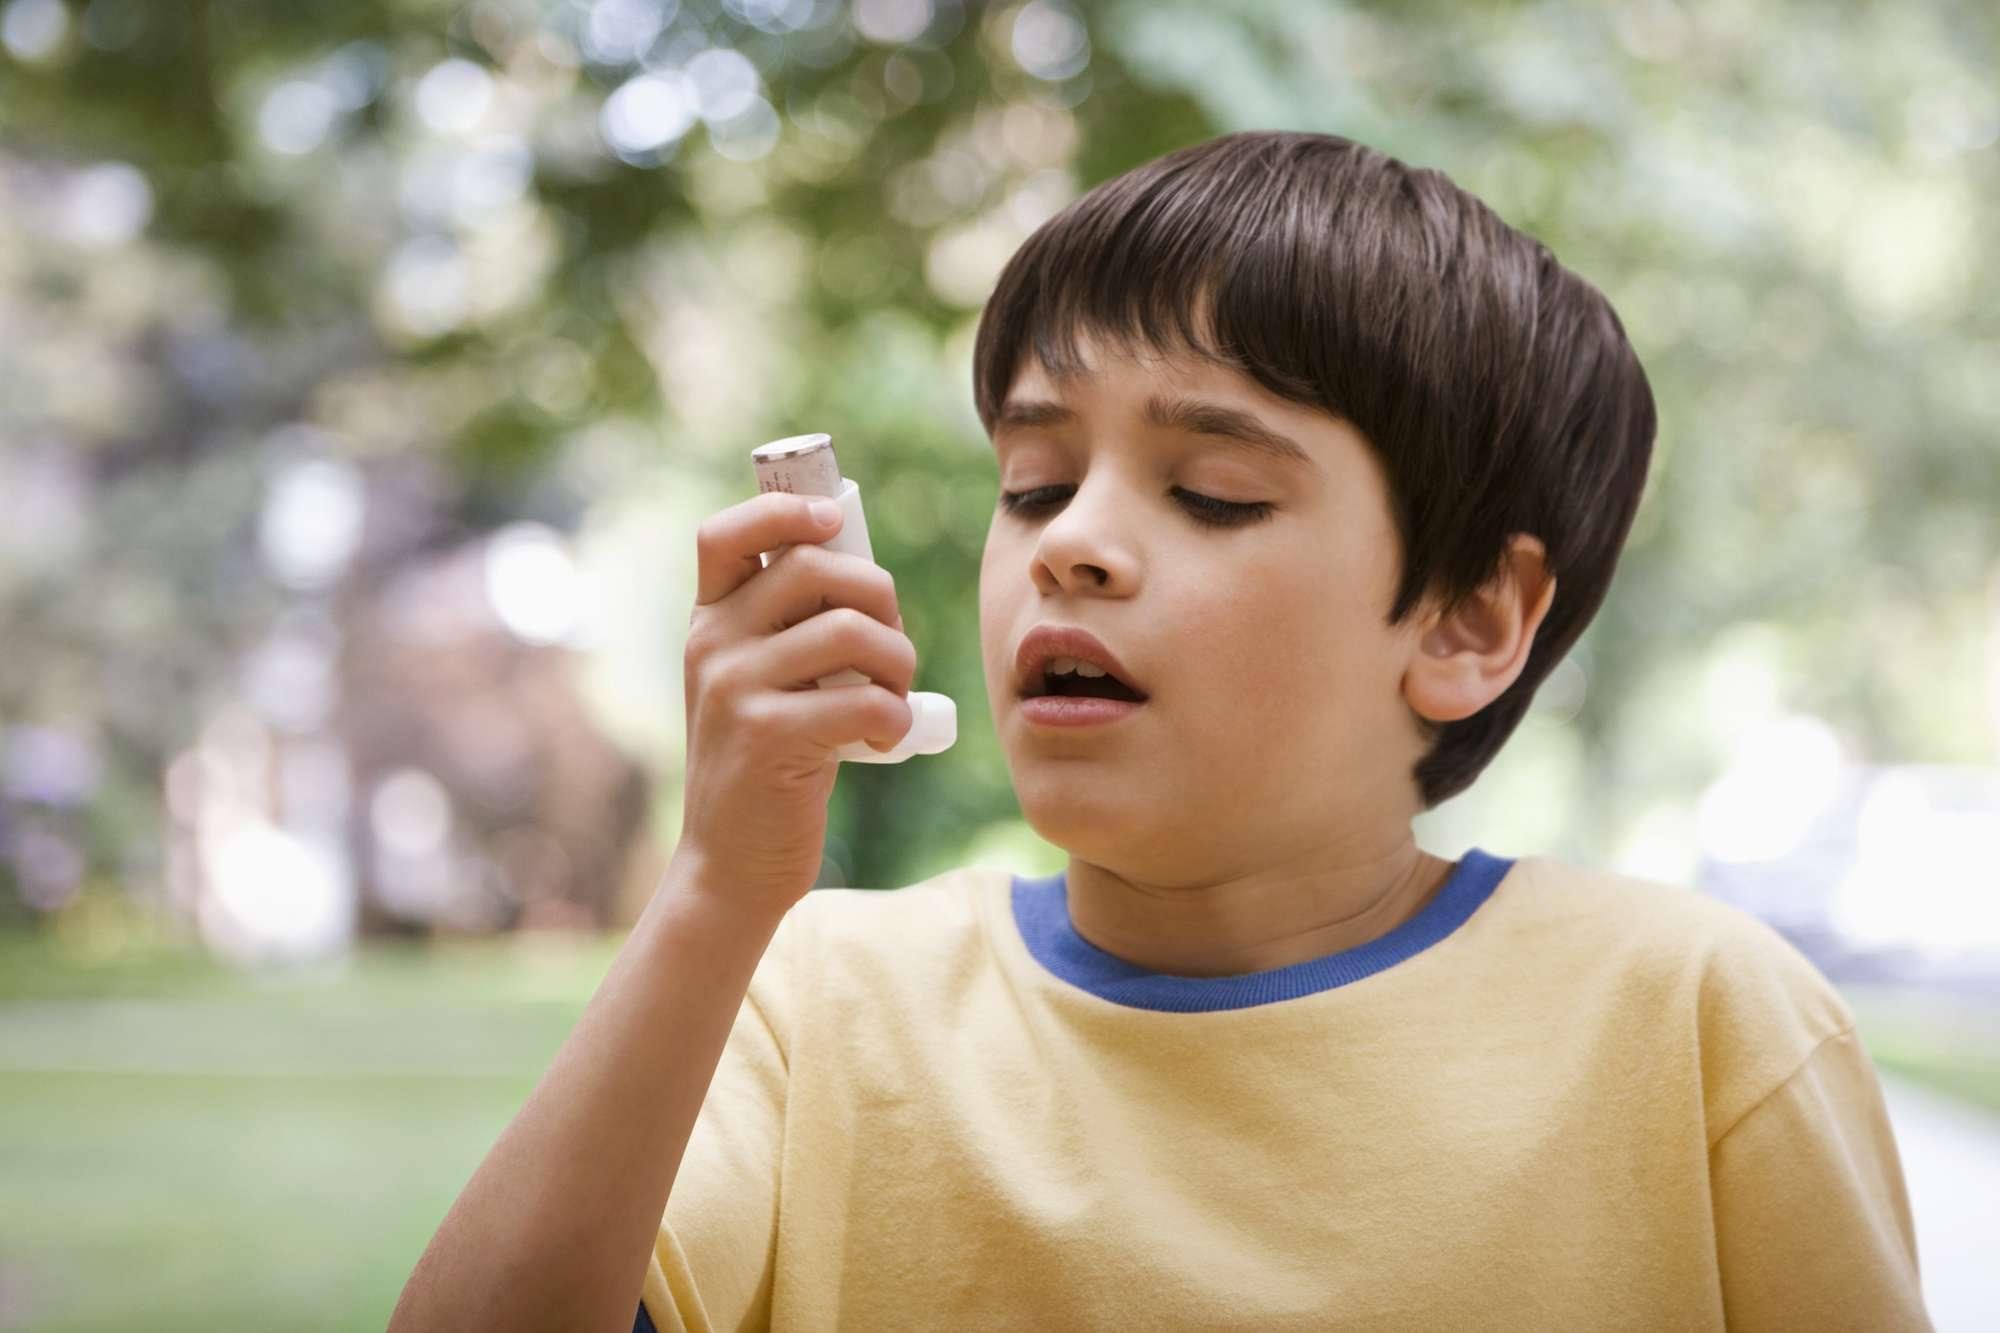 Small boy with inhaler